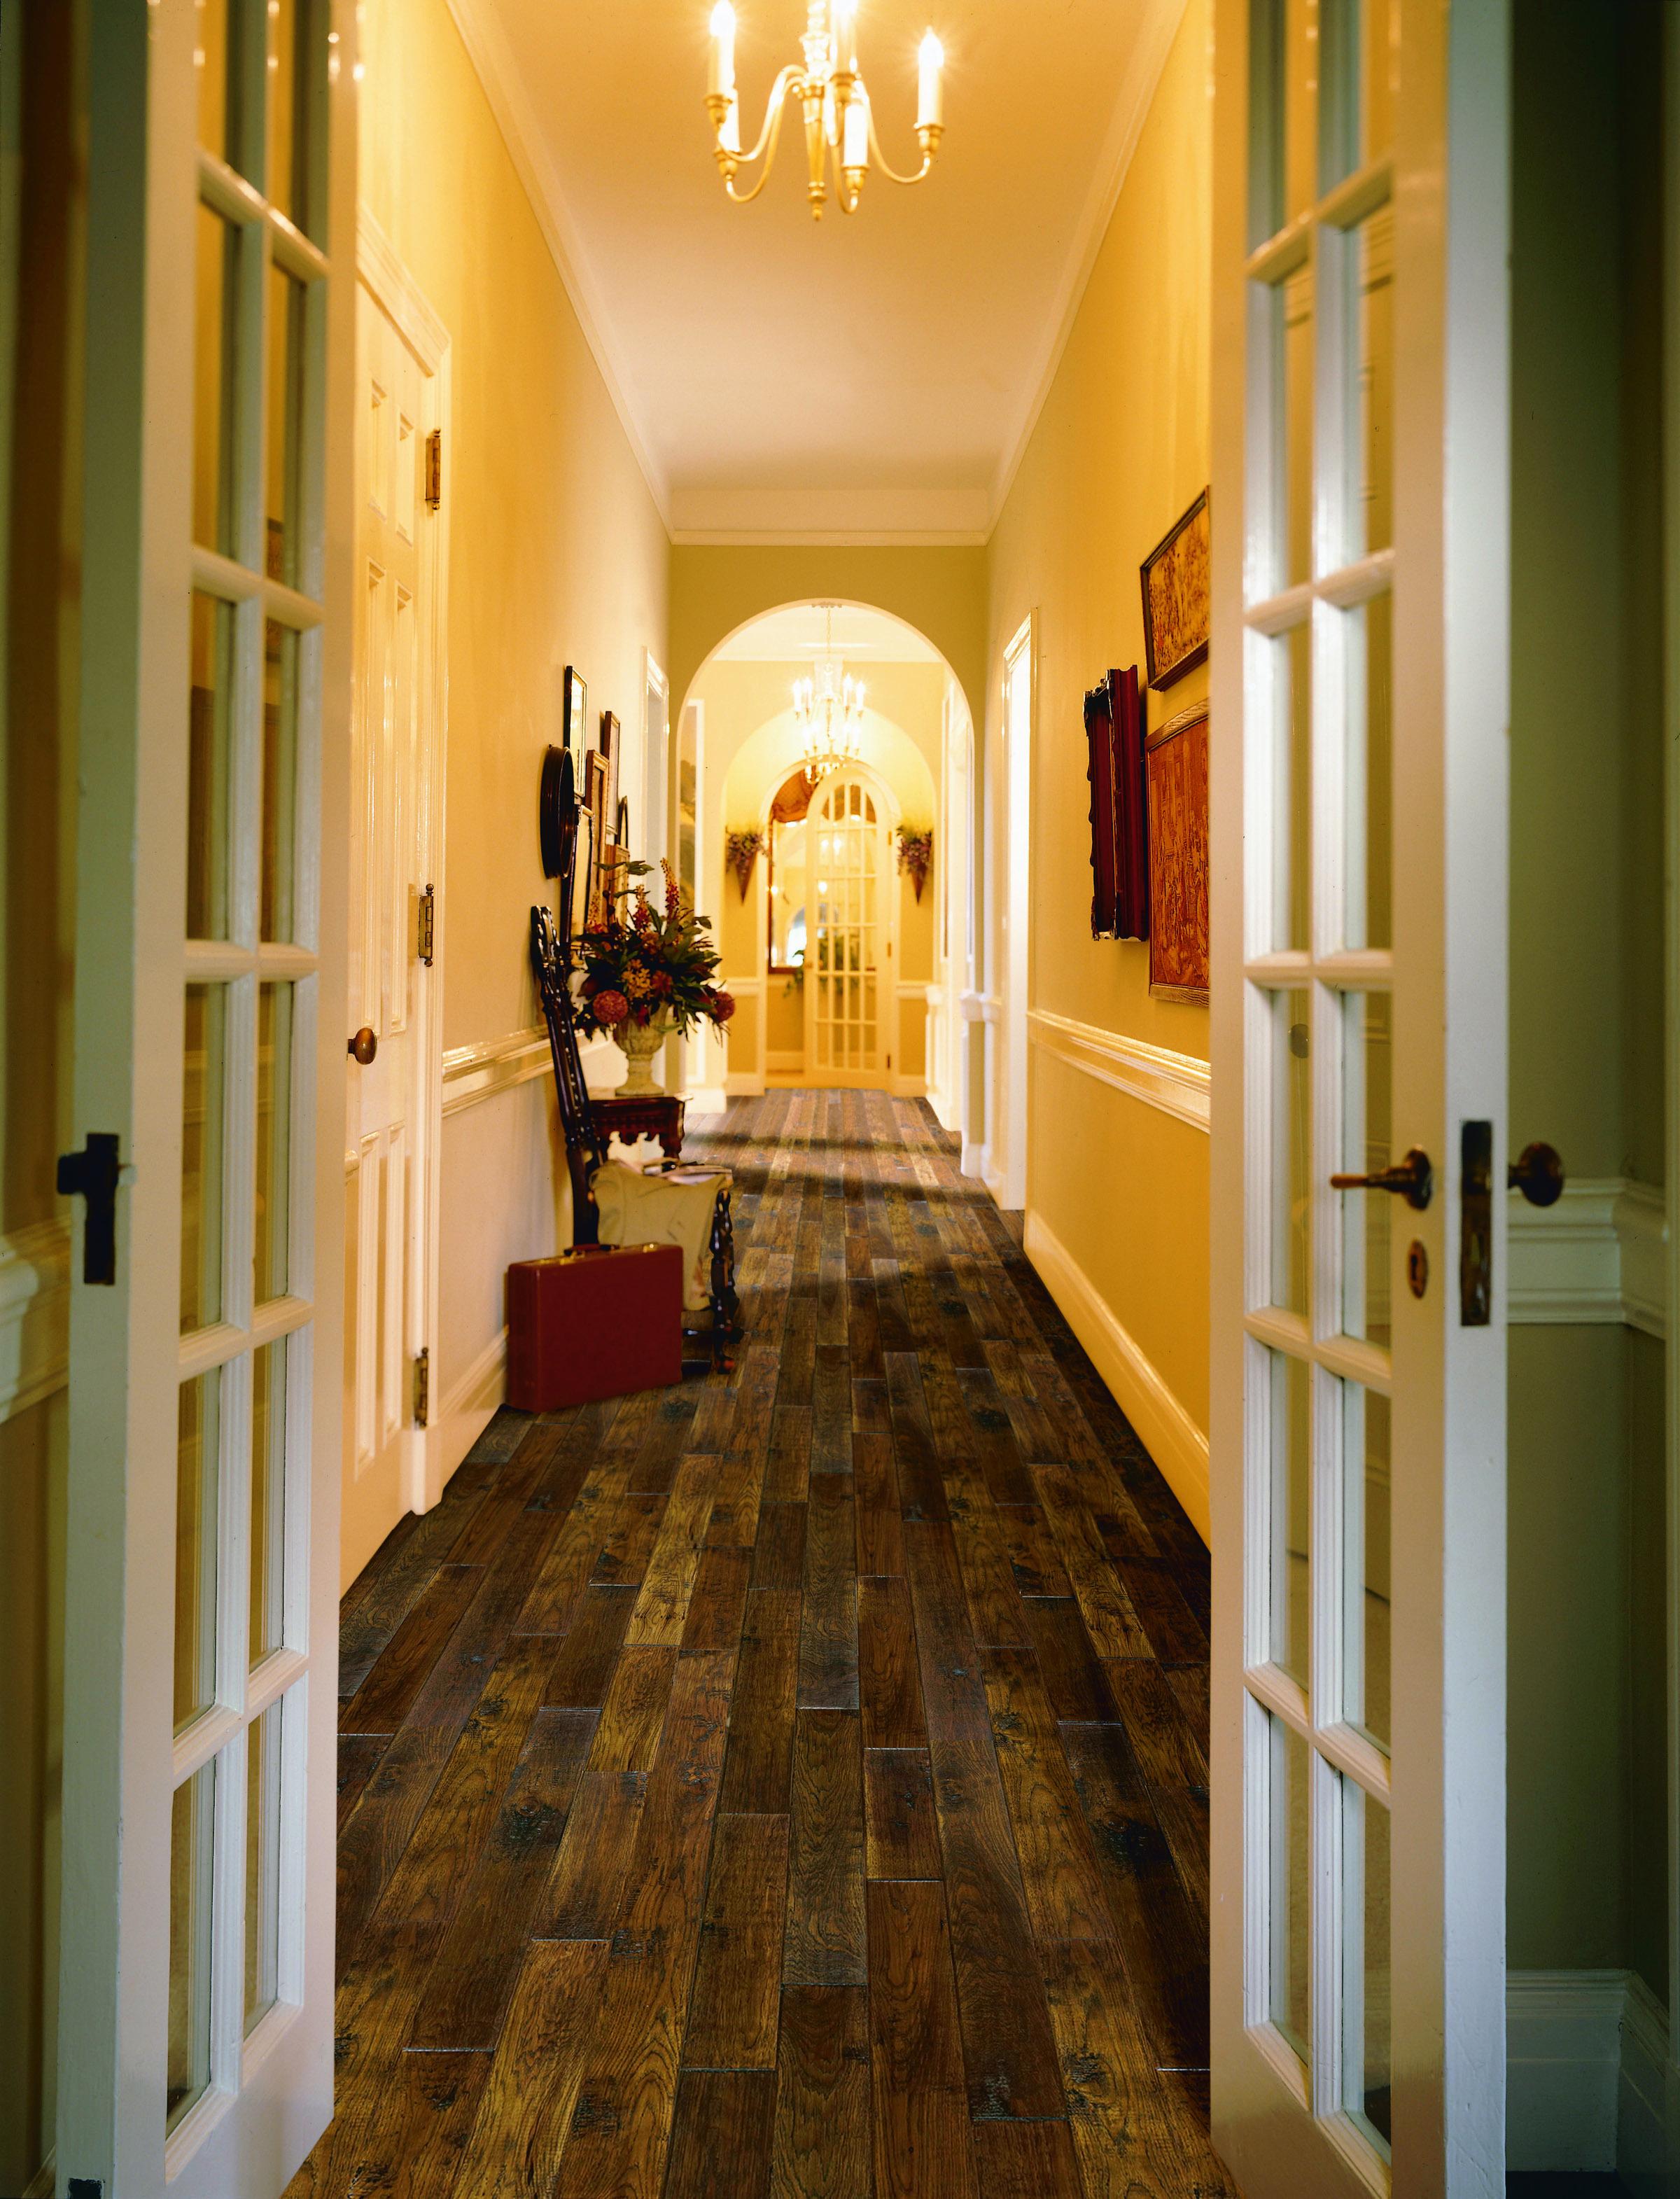 Hicks Carpet One Floor Home San Antonio Tx 78216